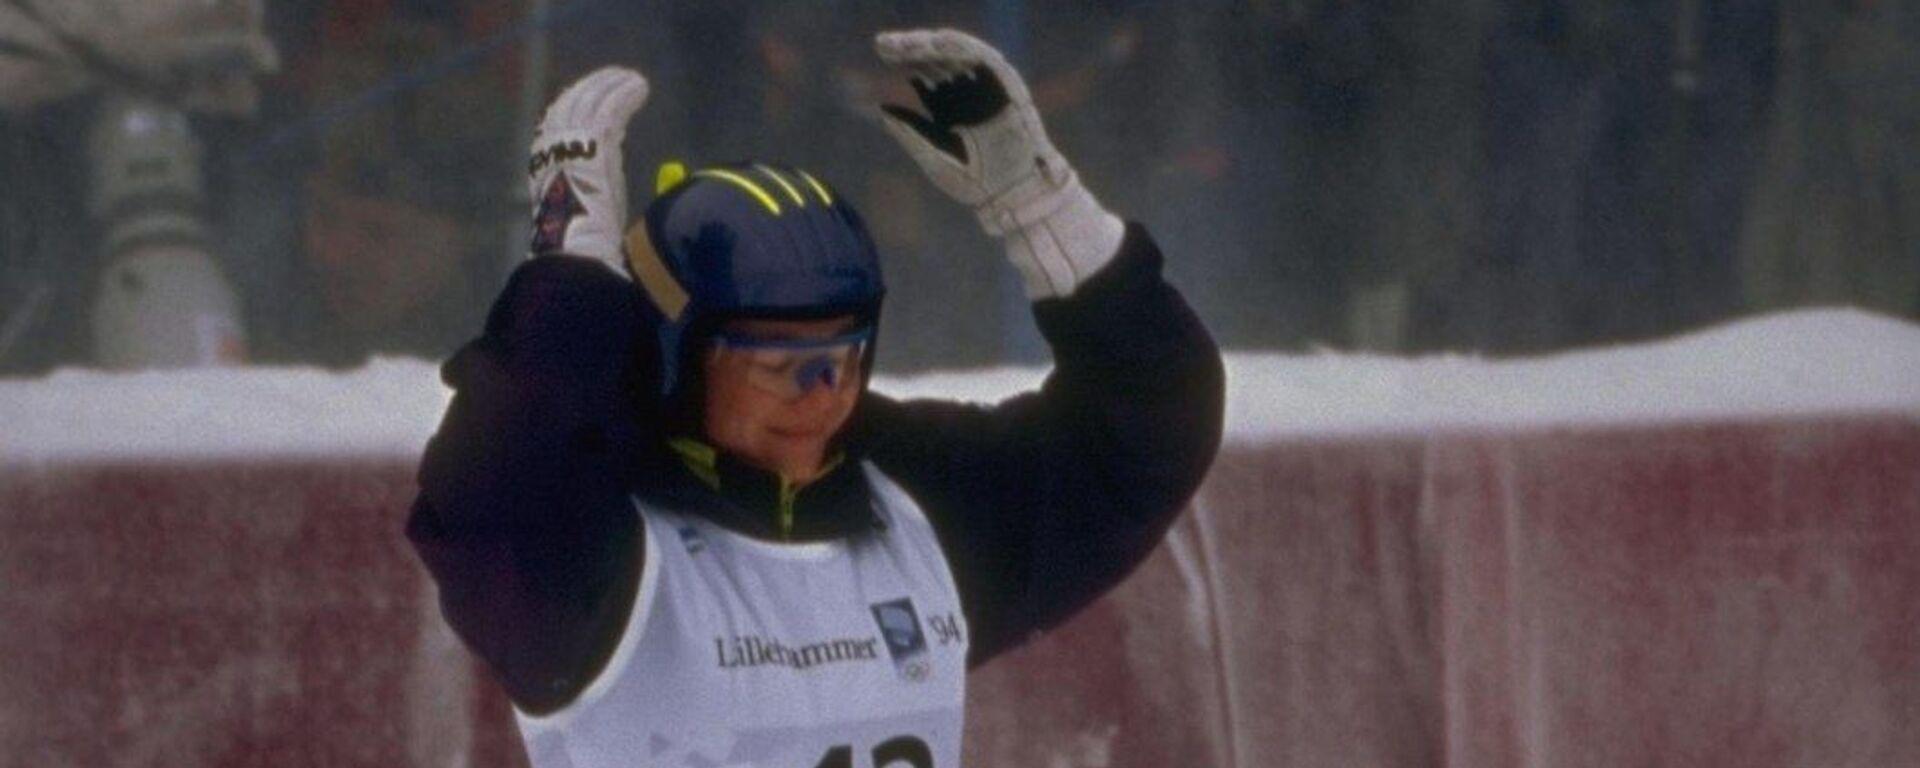 Единственная зимняя олимпийская чемпионка Узбекистана Лина Черязова - Sputnik Узбекистан, 1920, 25.03.2019